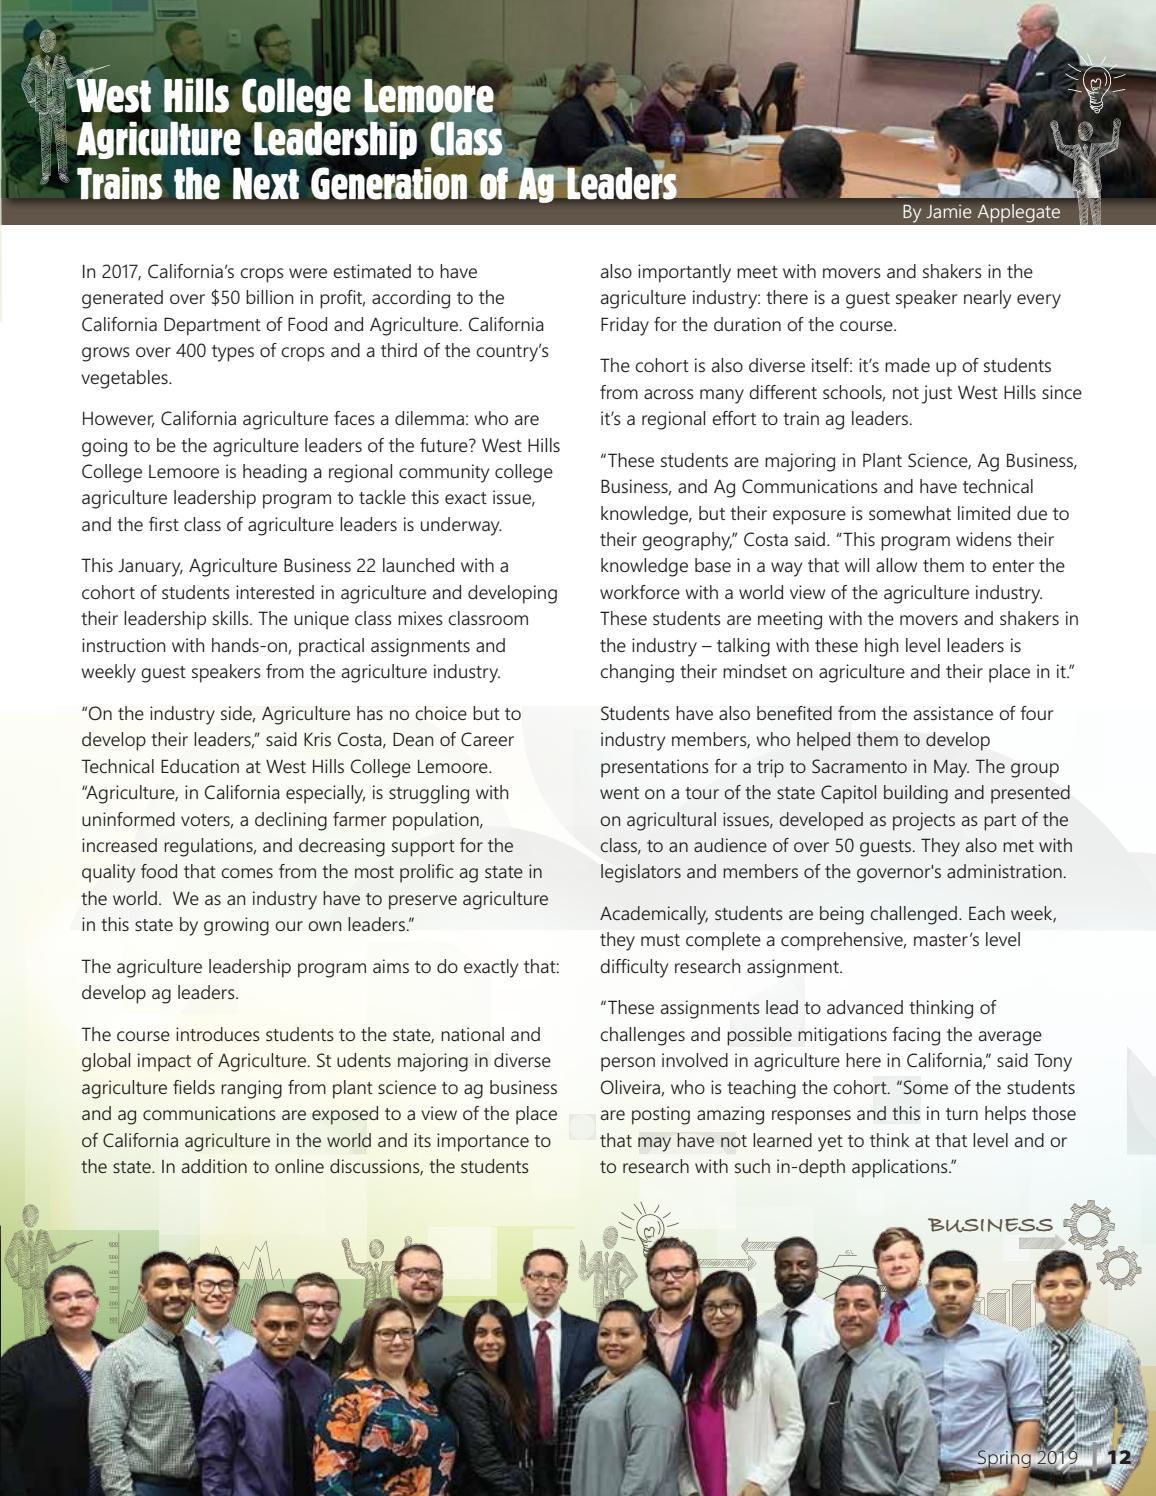 West Hills Magazine - Spring 2019 (Issue 12) by West Hills